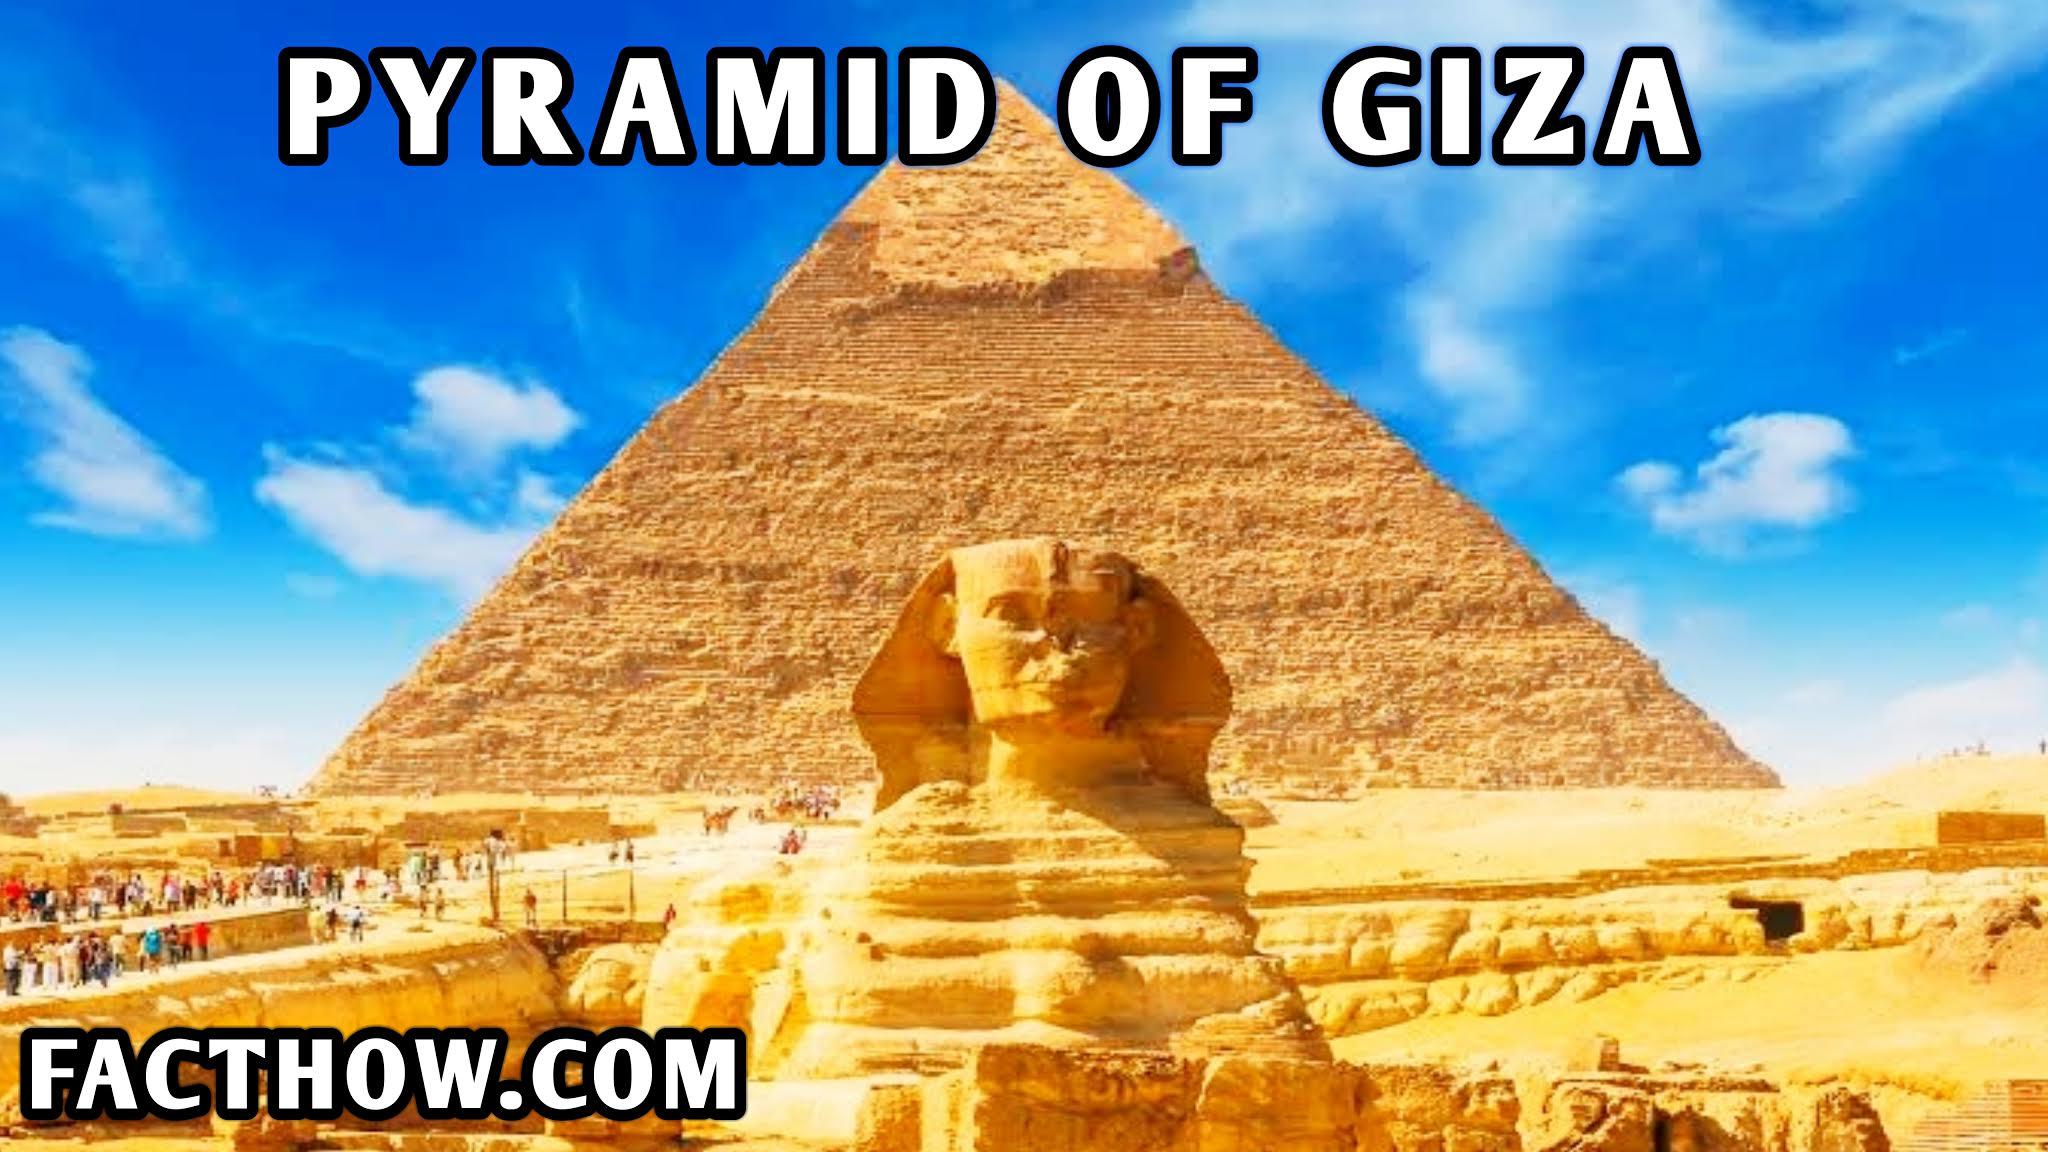 20-mysterious-facts-hindi-history-great-giza-pyramids-facthow-fact-how-rahasyamayi-tathya-rochak-tathya-facts-hindi-Menkaure-king-egypt-Mishor-misr